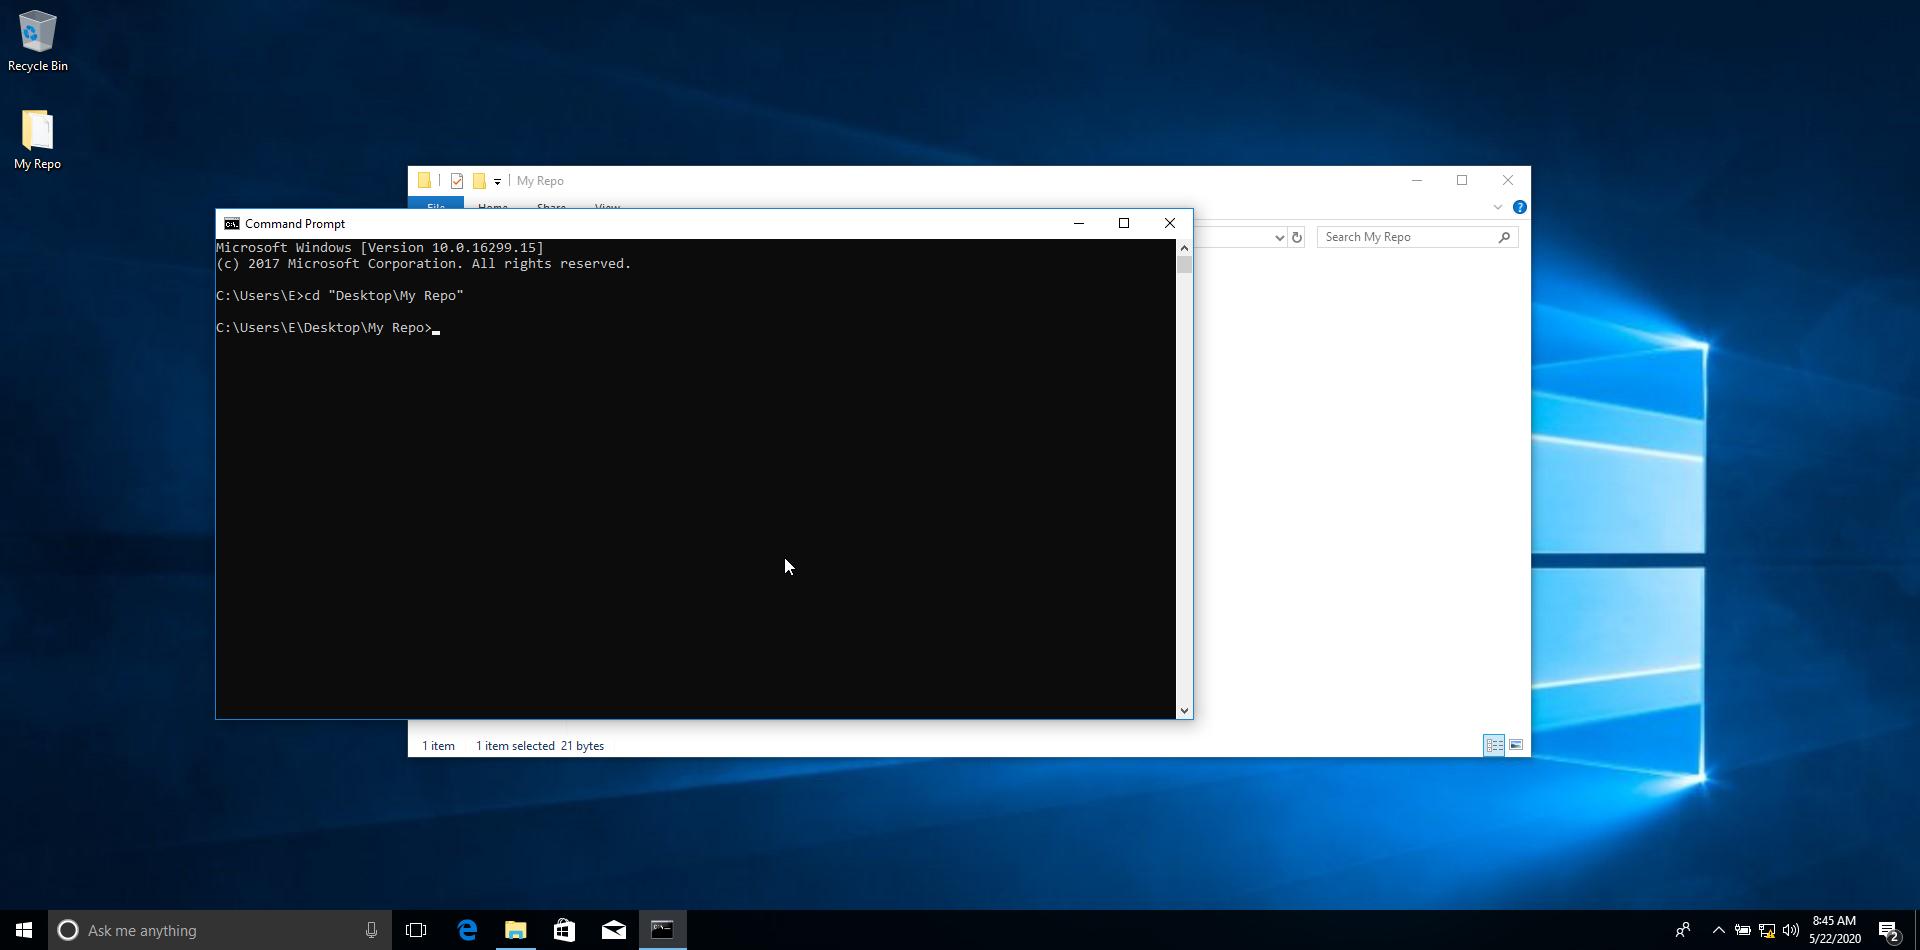 Command Line in Folder Location